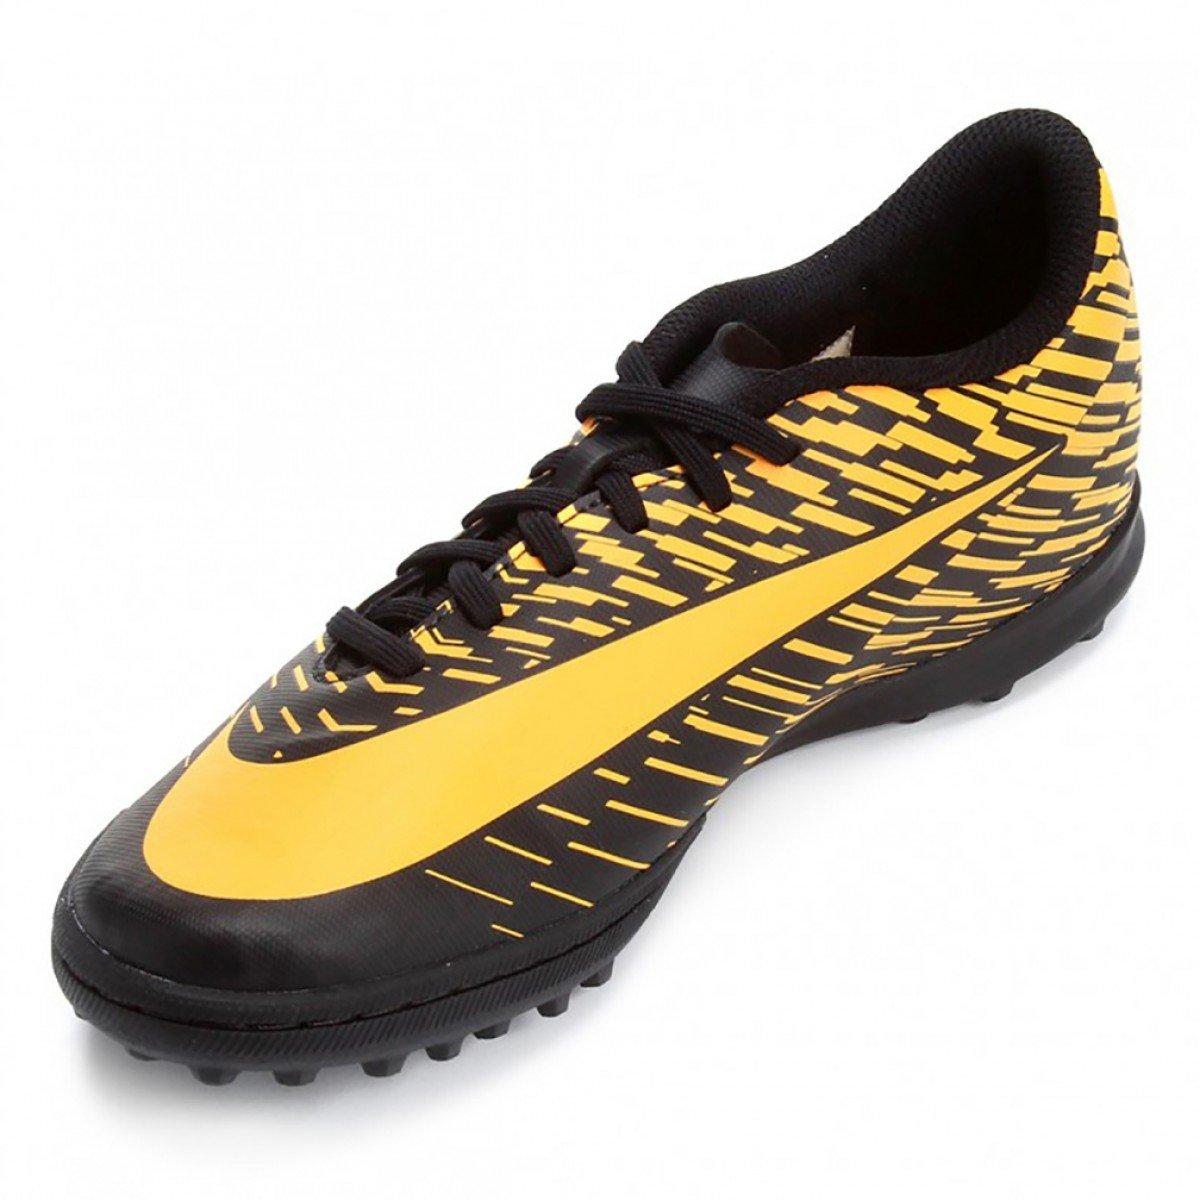 Chuteira Nike Bravatax II Tf Original Laranja - Compre Agora  01ae72ee42019